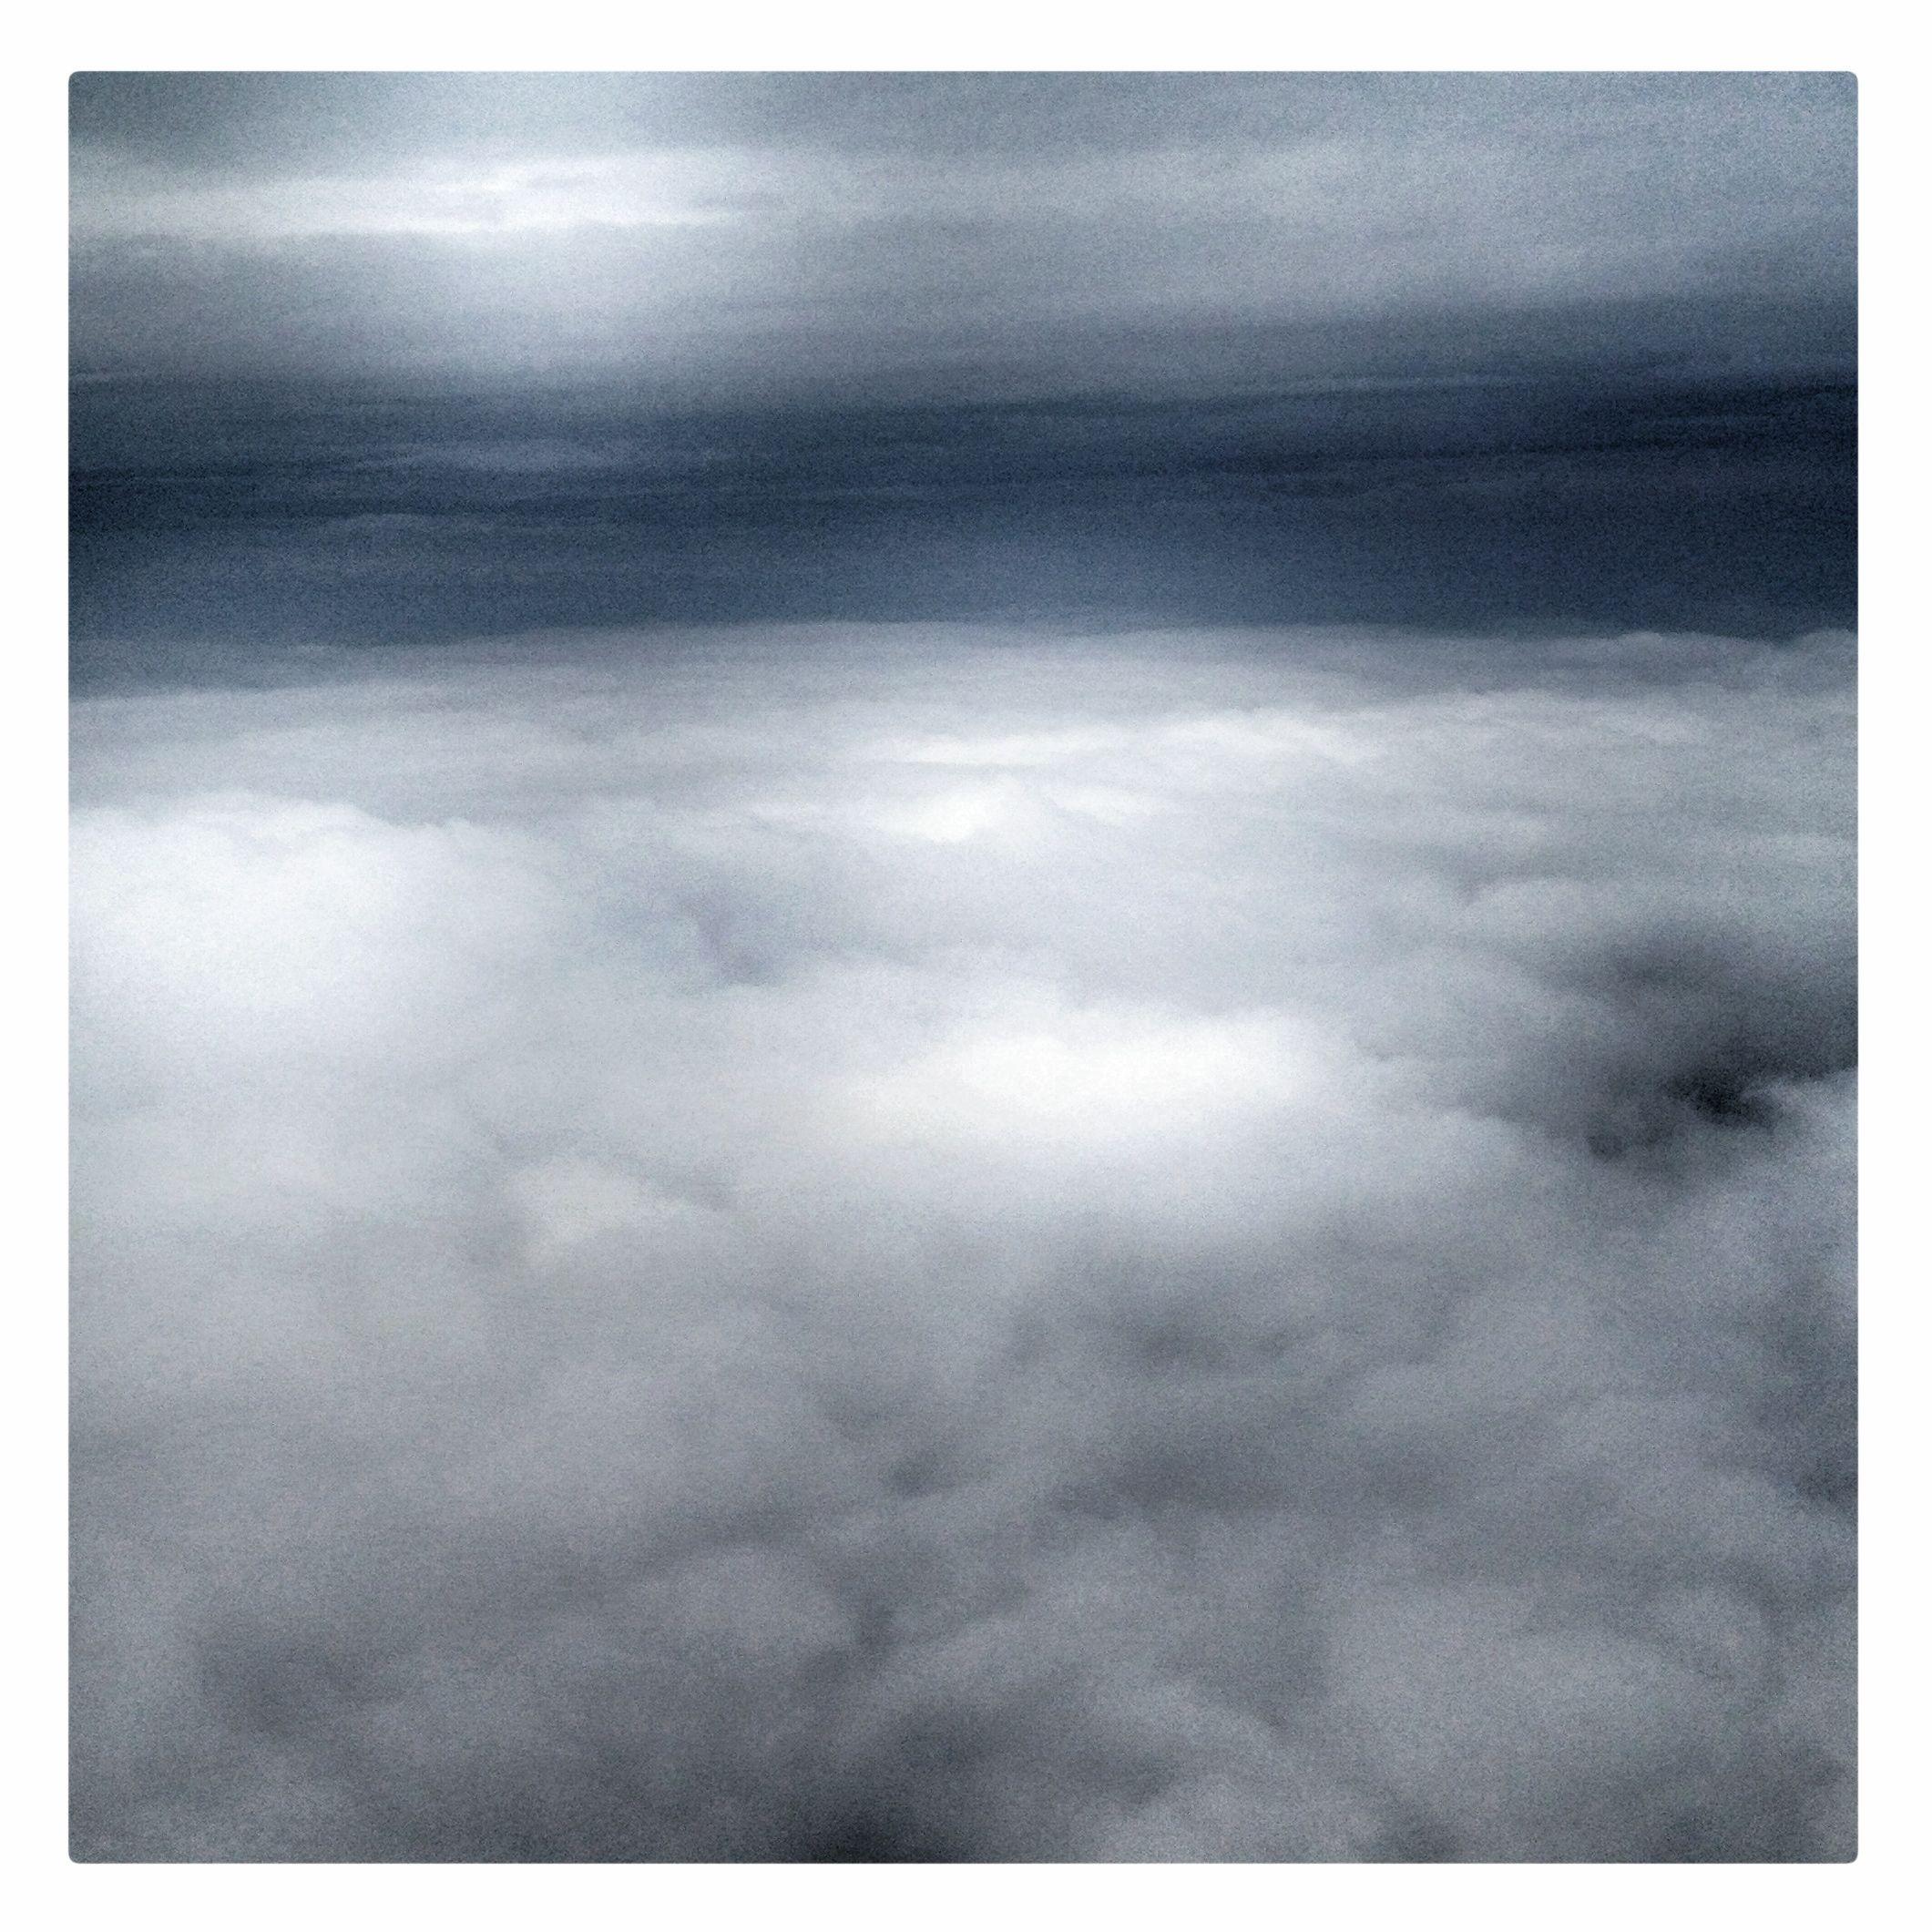 De cielo luces sky clouds lights flying